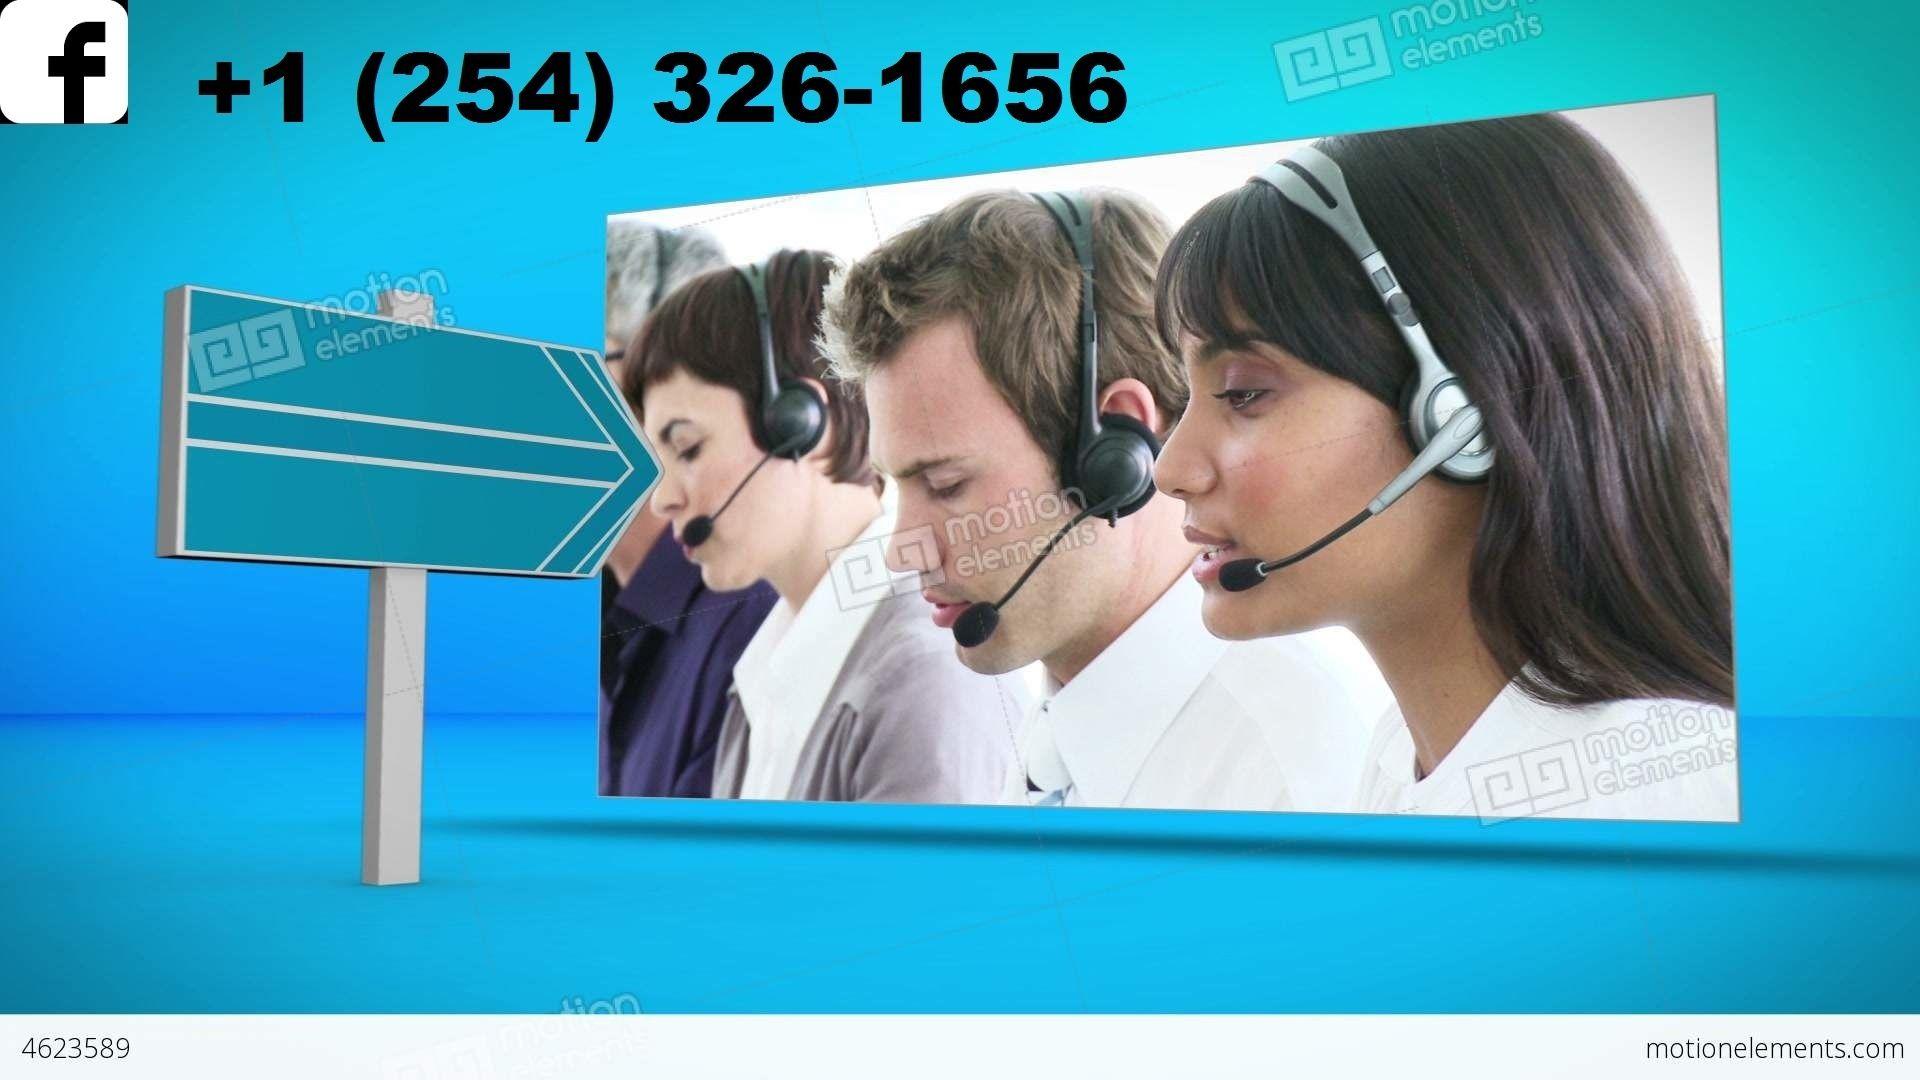 Facebook 24 hour customer service support number 1254